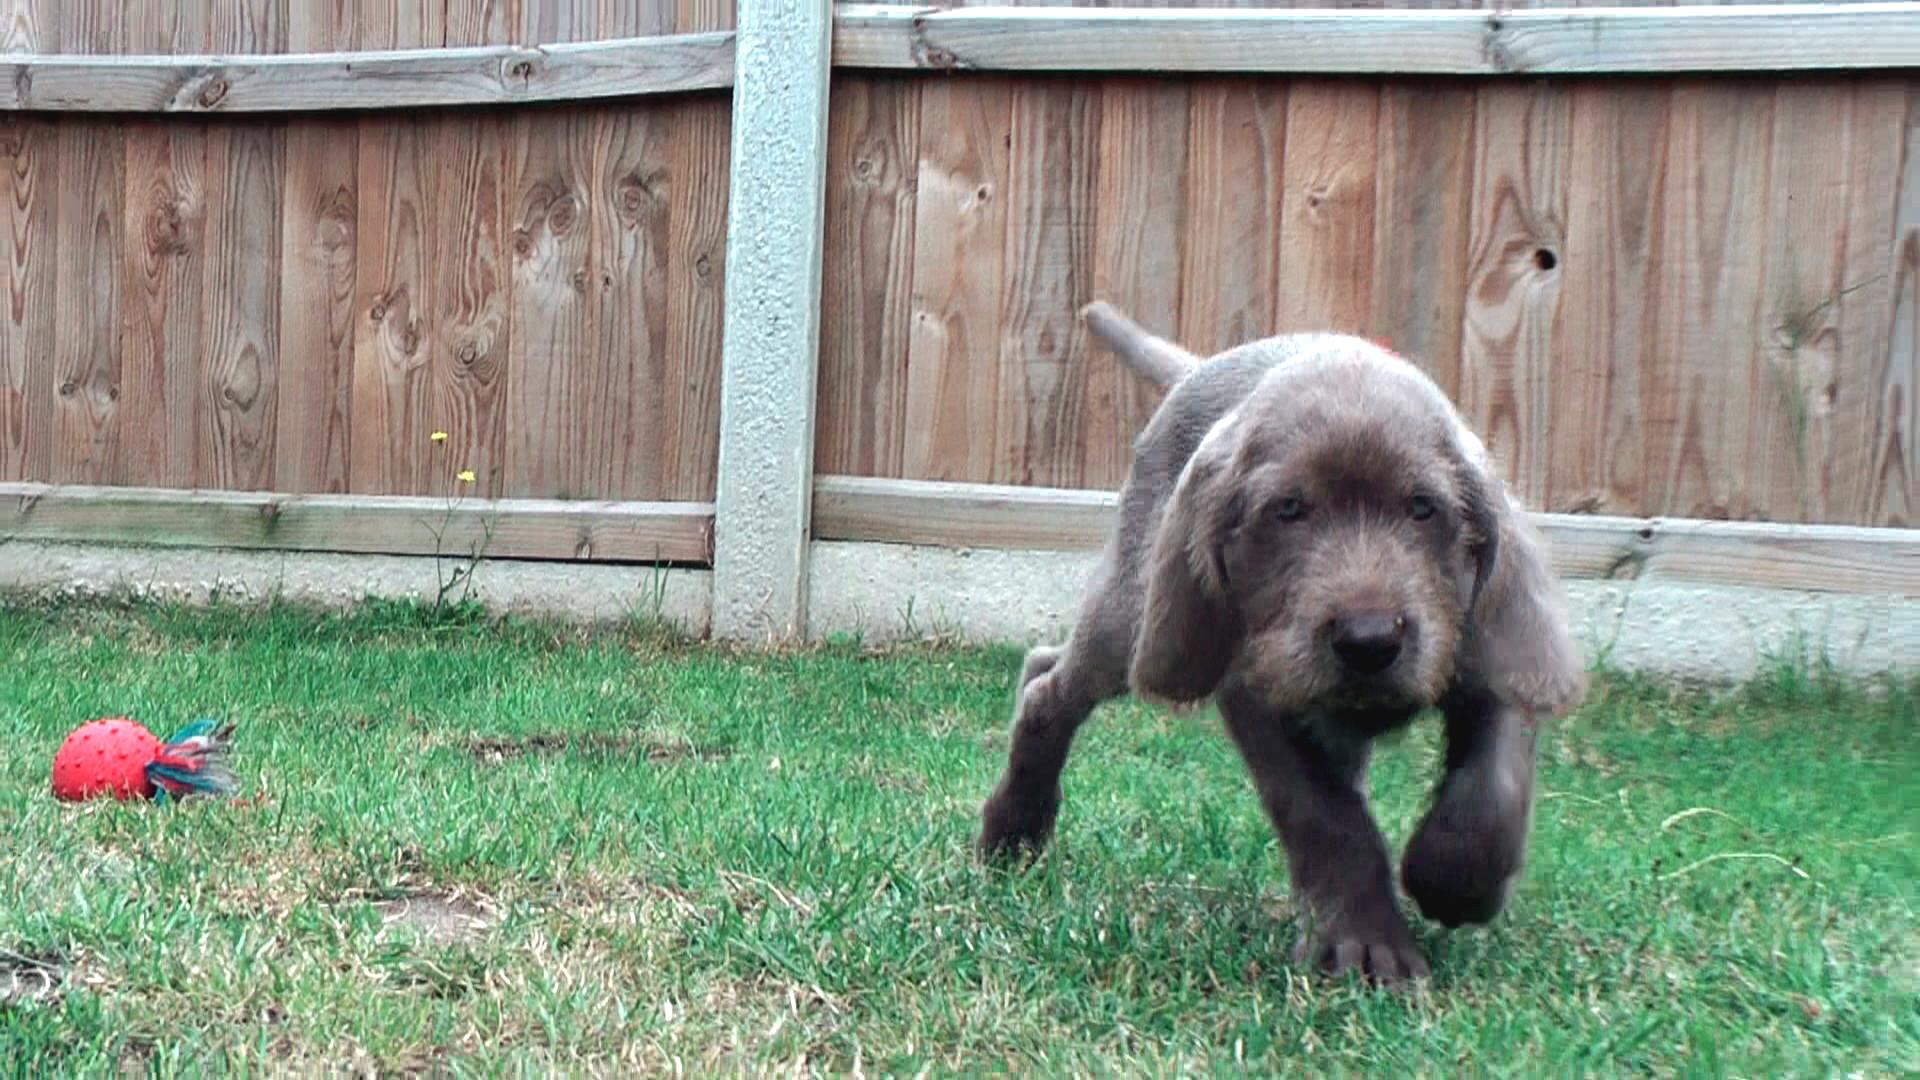 Slovakian Rough-haired Pointer Dog: Slovakian Walking Slovakian Rough Haired Pointer Puppy Breed